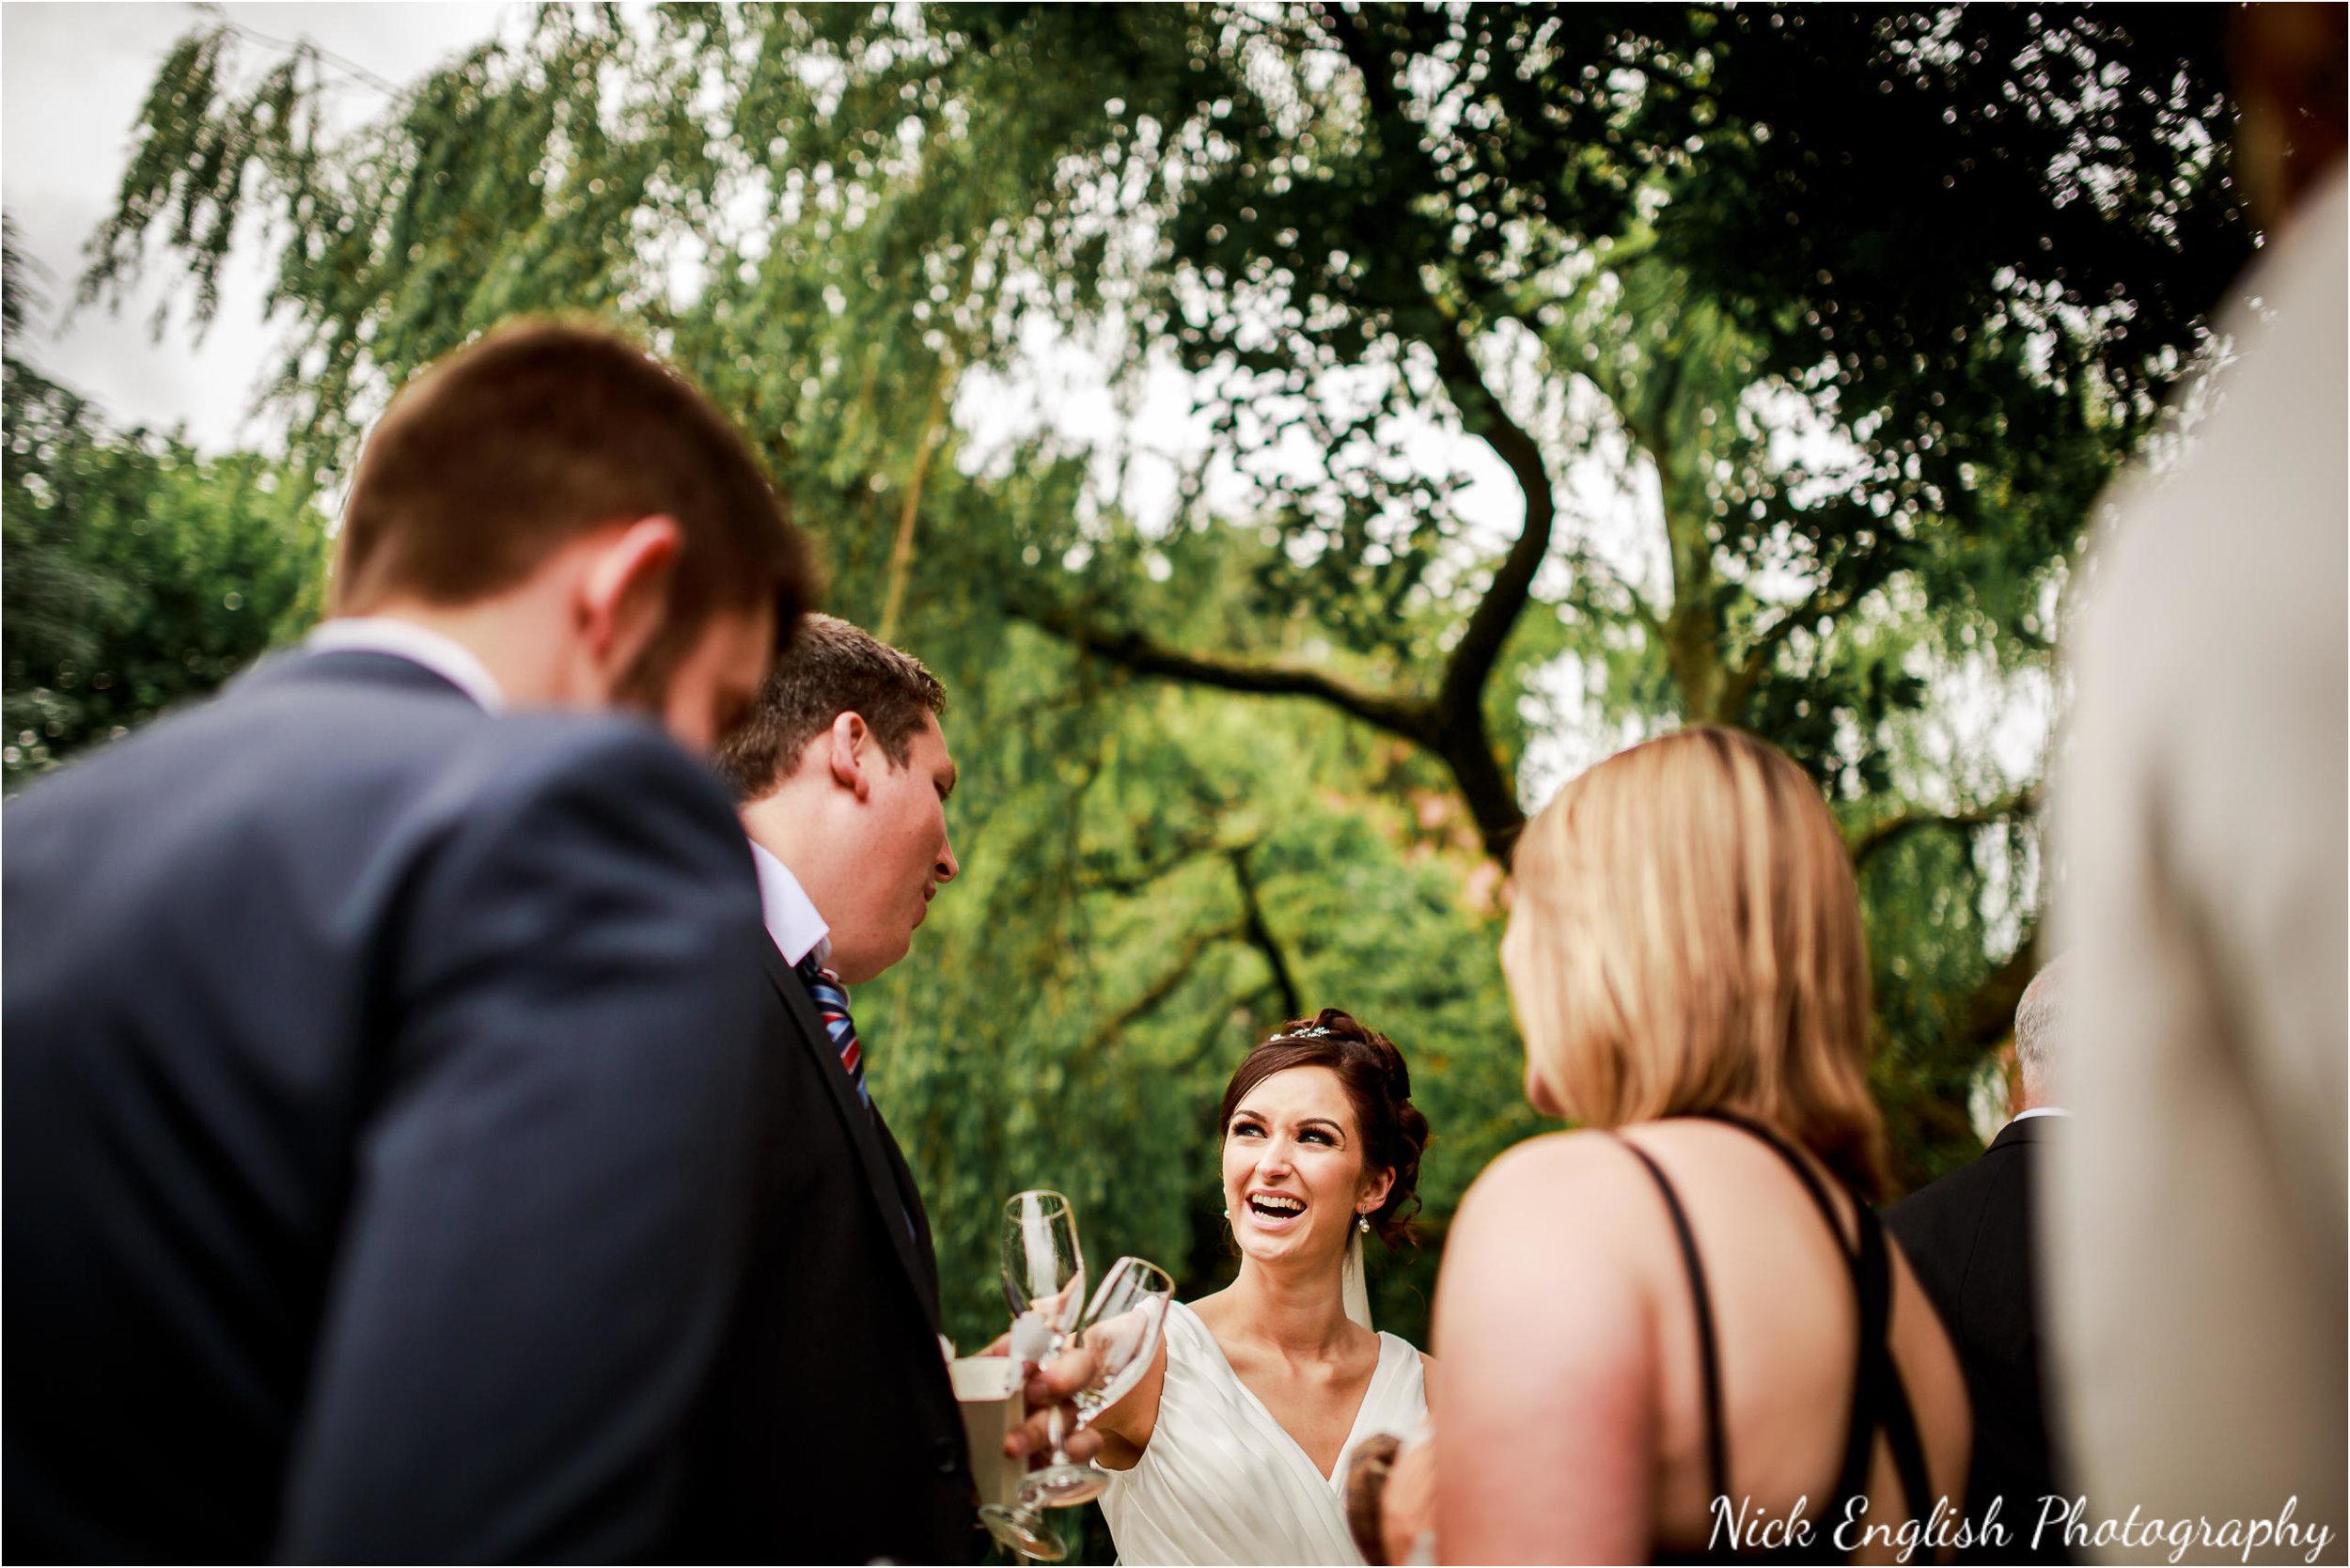 Emily David Wedding Photographs at Barton Grange Preston by Nick English Photography 128jpg.jpeg